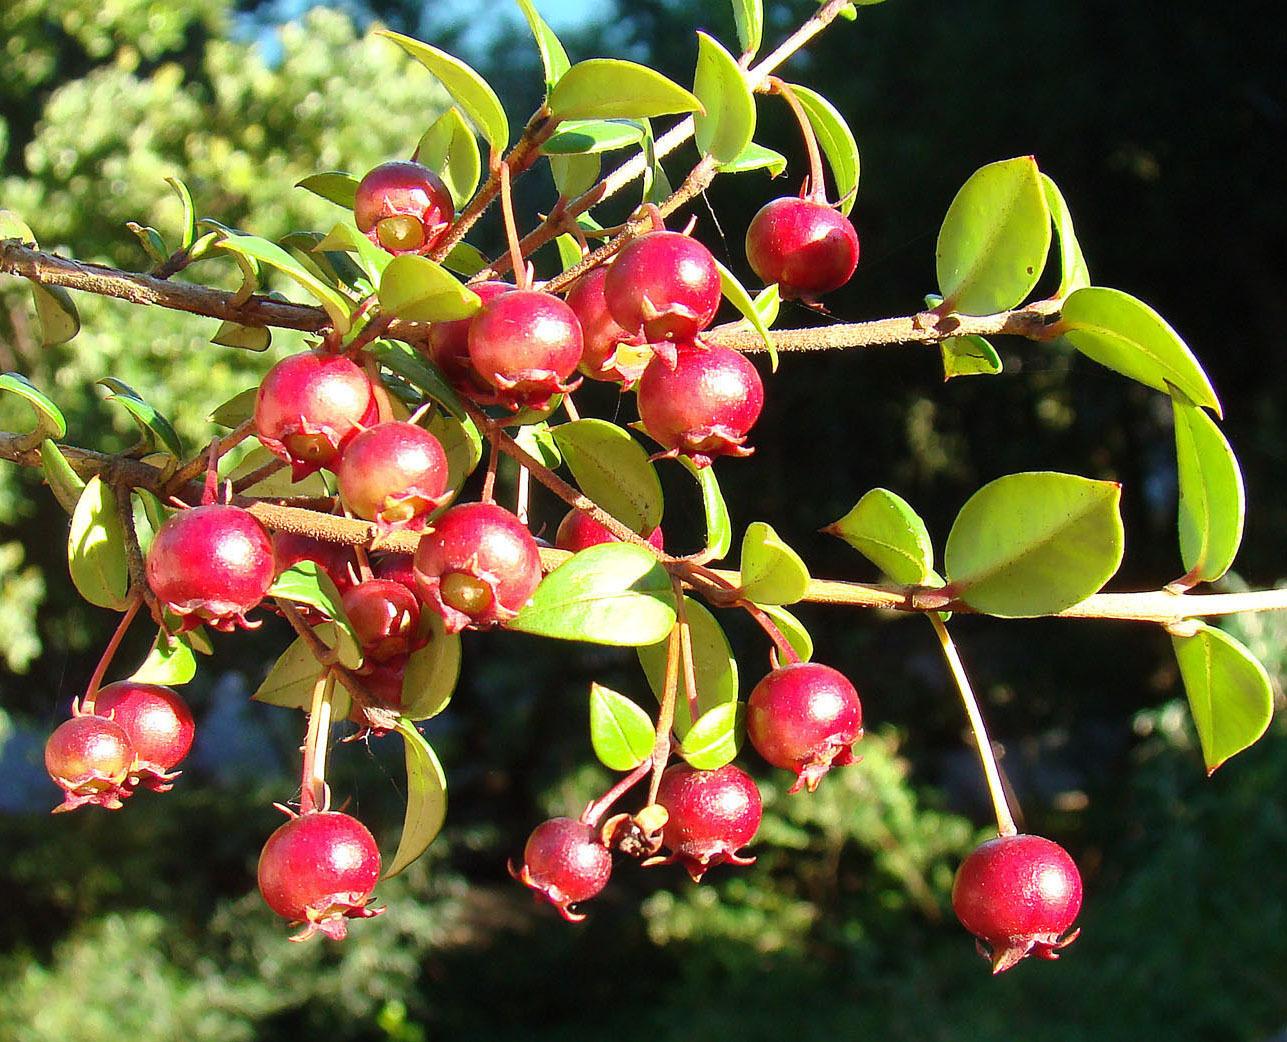 Image of Chilean guava